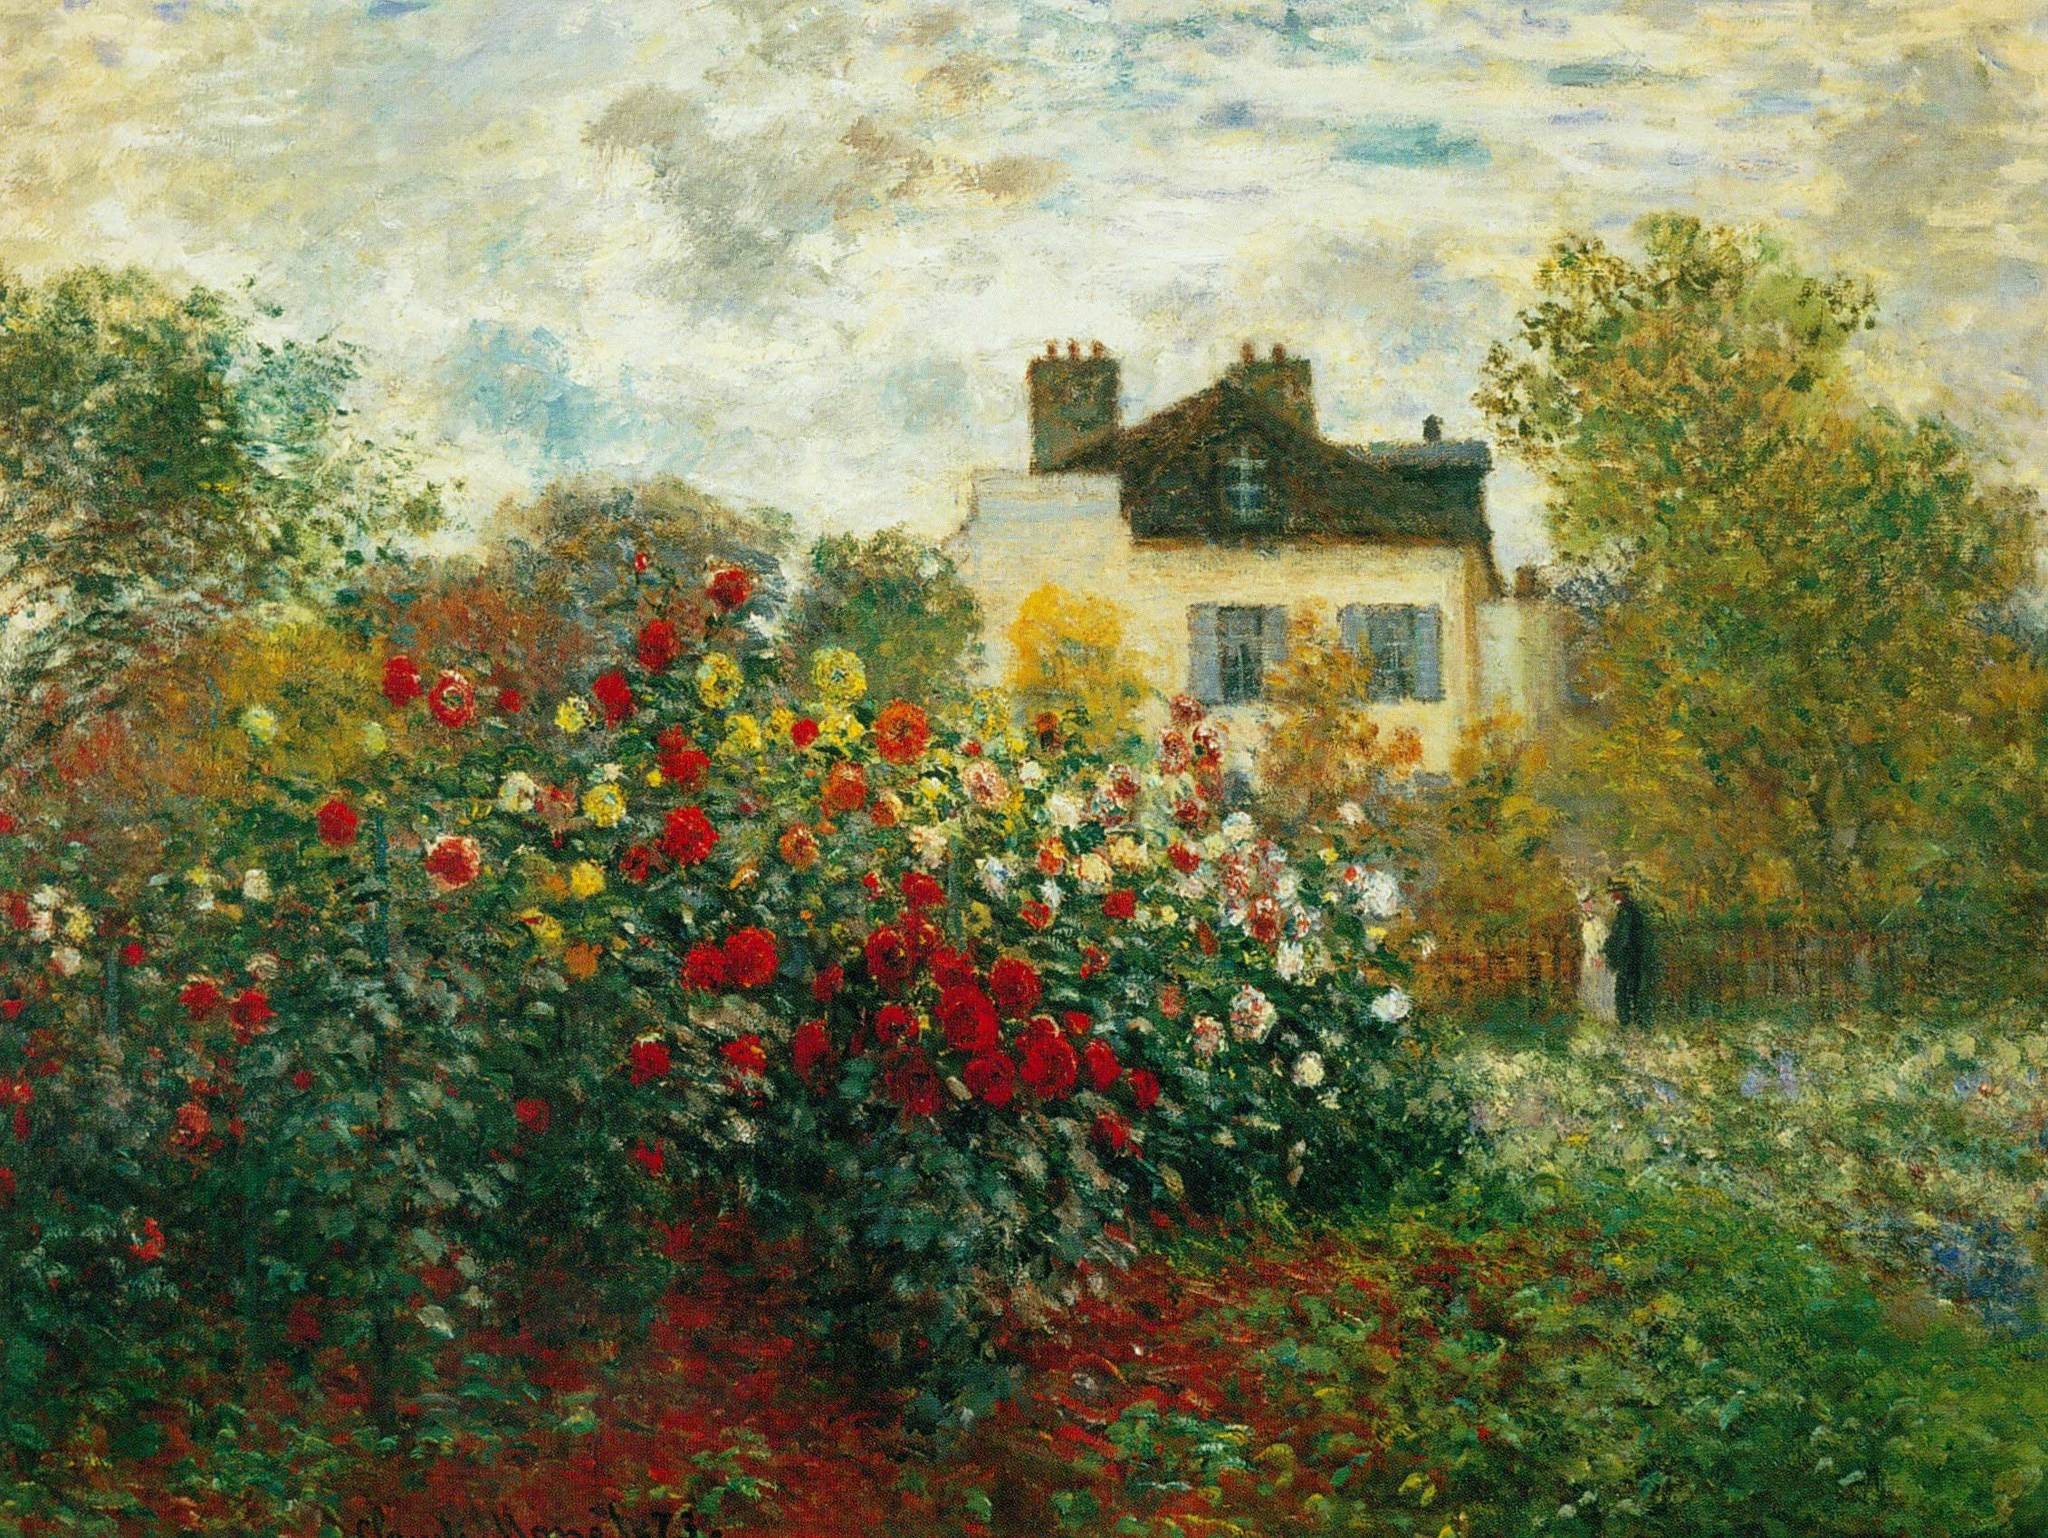 Claude Monet Garten Luxus Monet S Garden at Argenteuil by Claude Monet